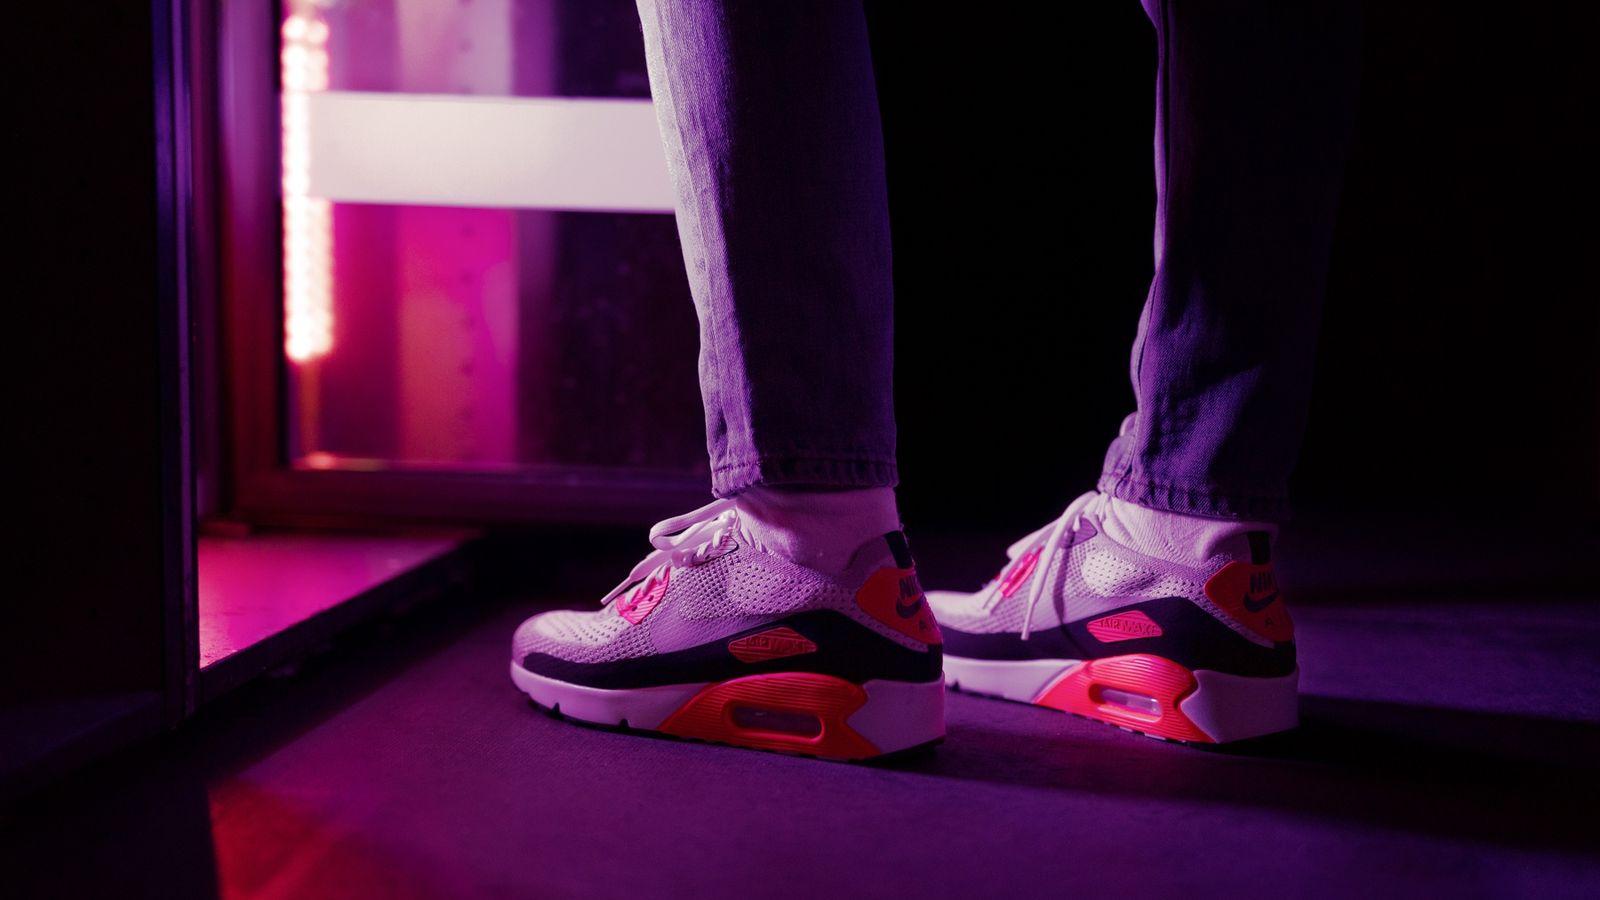 Nike Air Max Day 2017